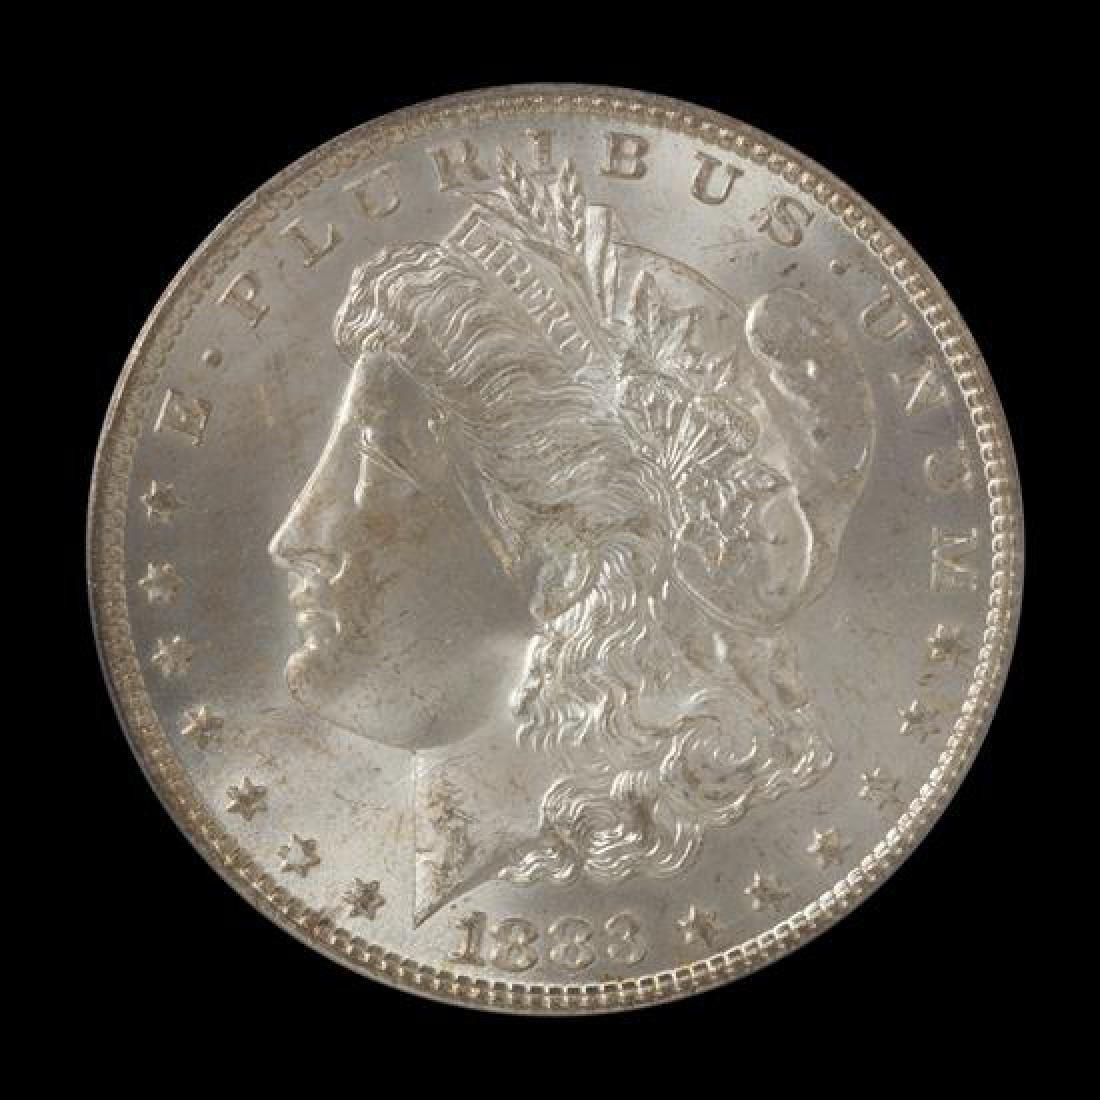 A United States 1883-CC Morgan Silver Dollar Coin